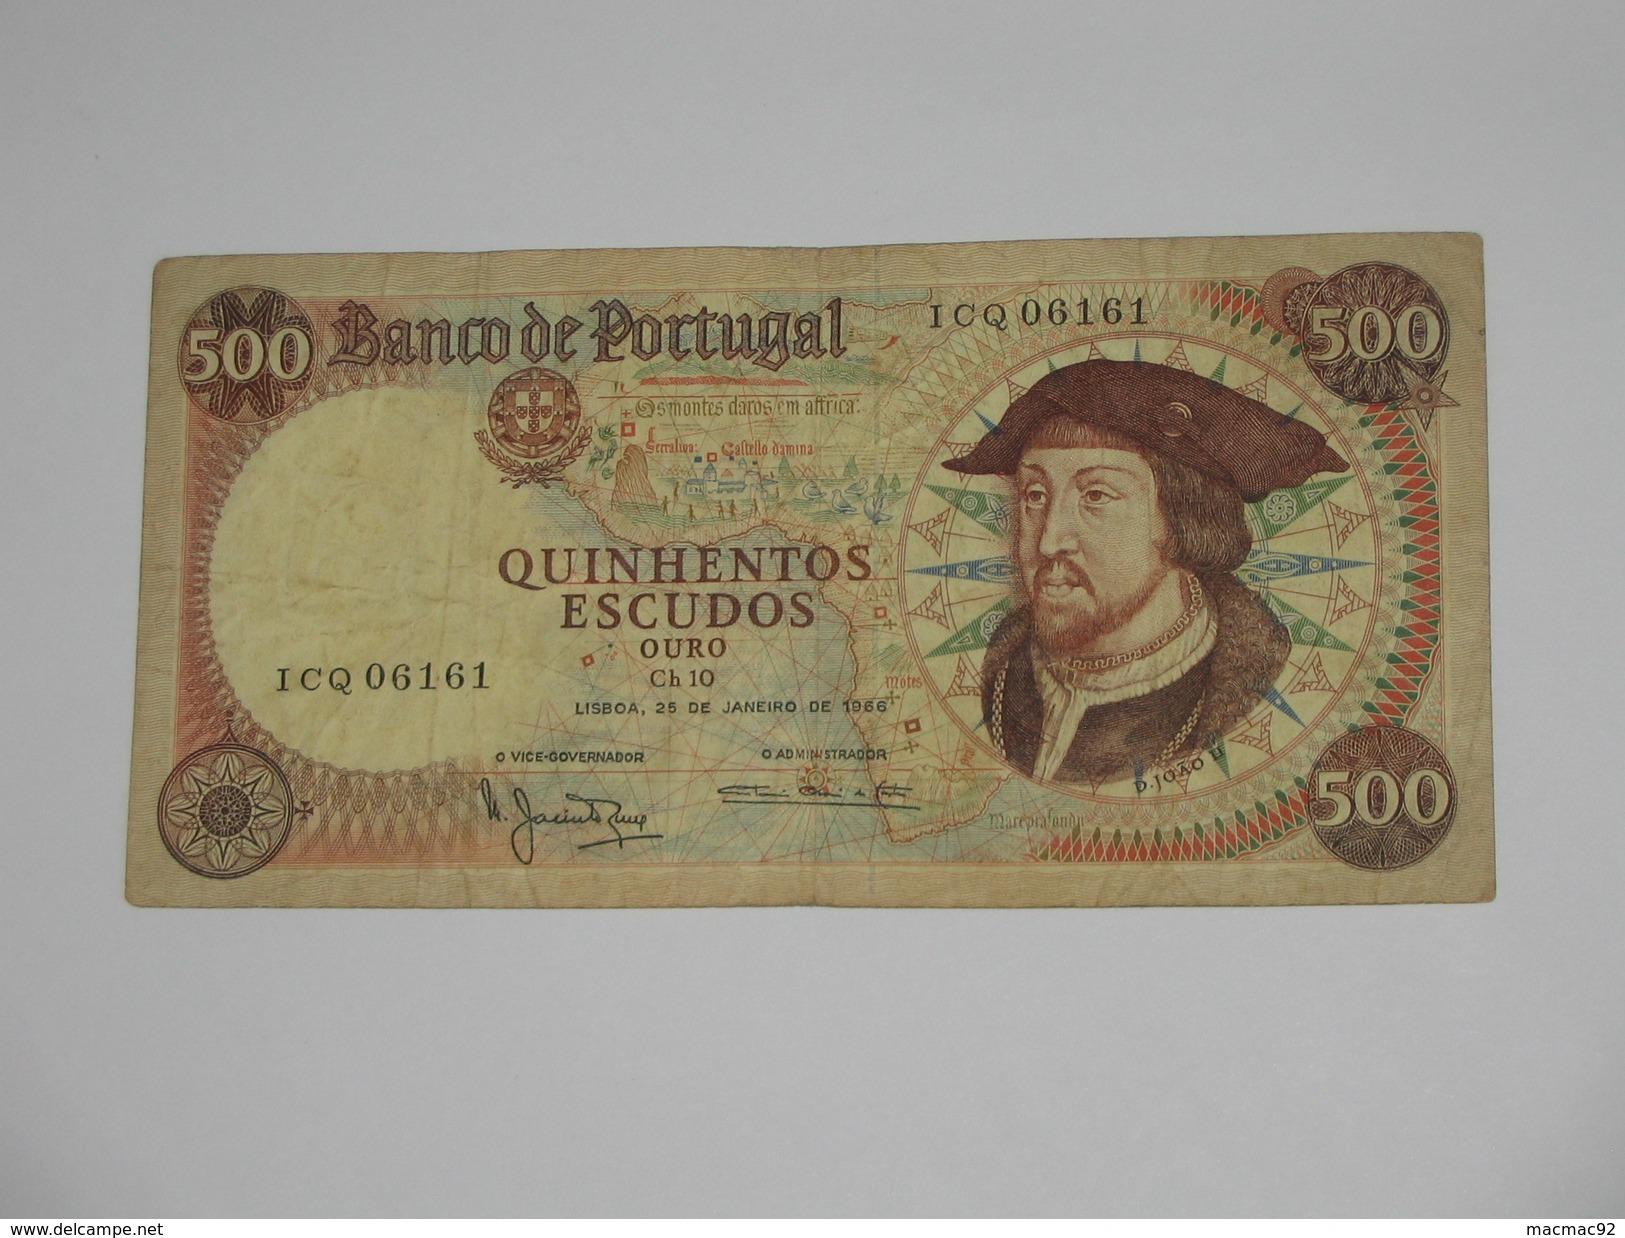 500 Quinhentos Escudos Ouro 1966 - Banco De  PORTUGAL  **** EN ACHAT IMMEDIAT **** - Portugal